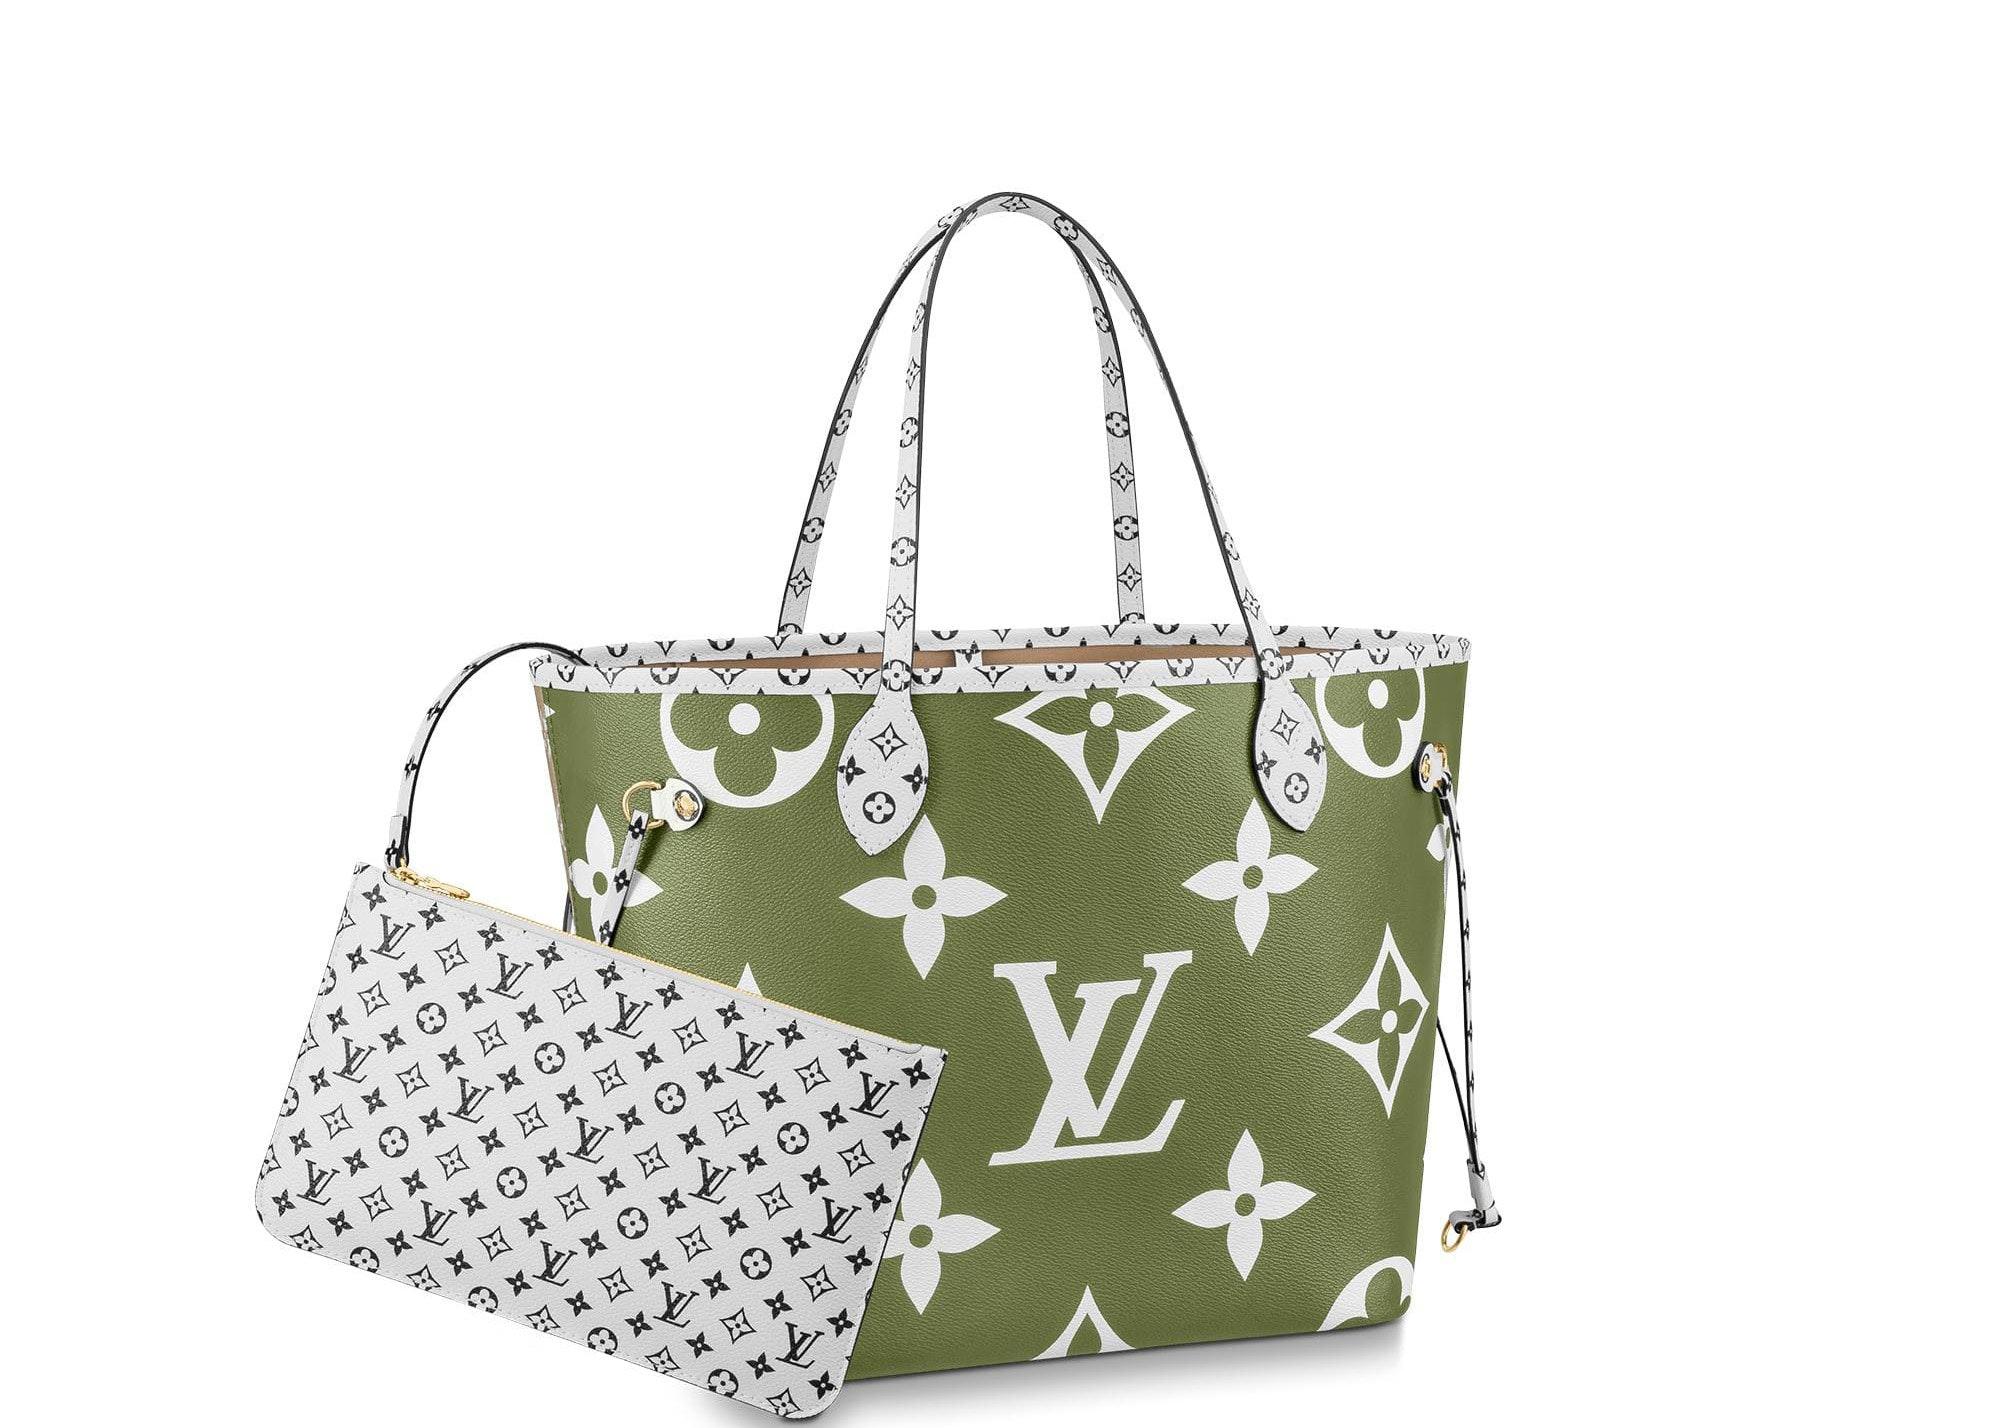 Louis Vuitton Neverfull Giant Monogram MM Khaki Green/Beige